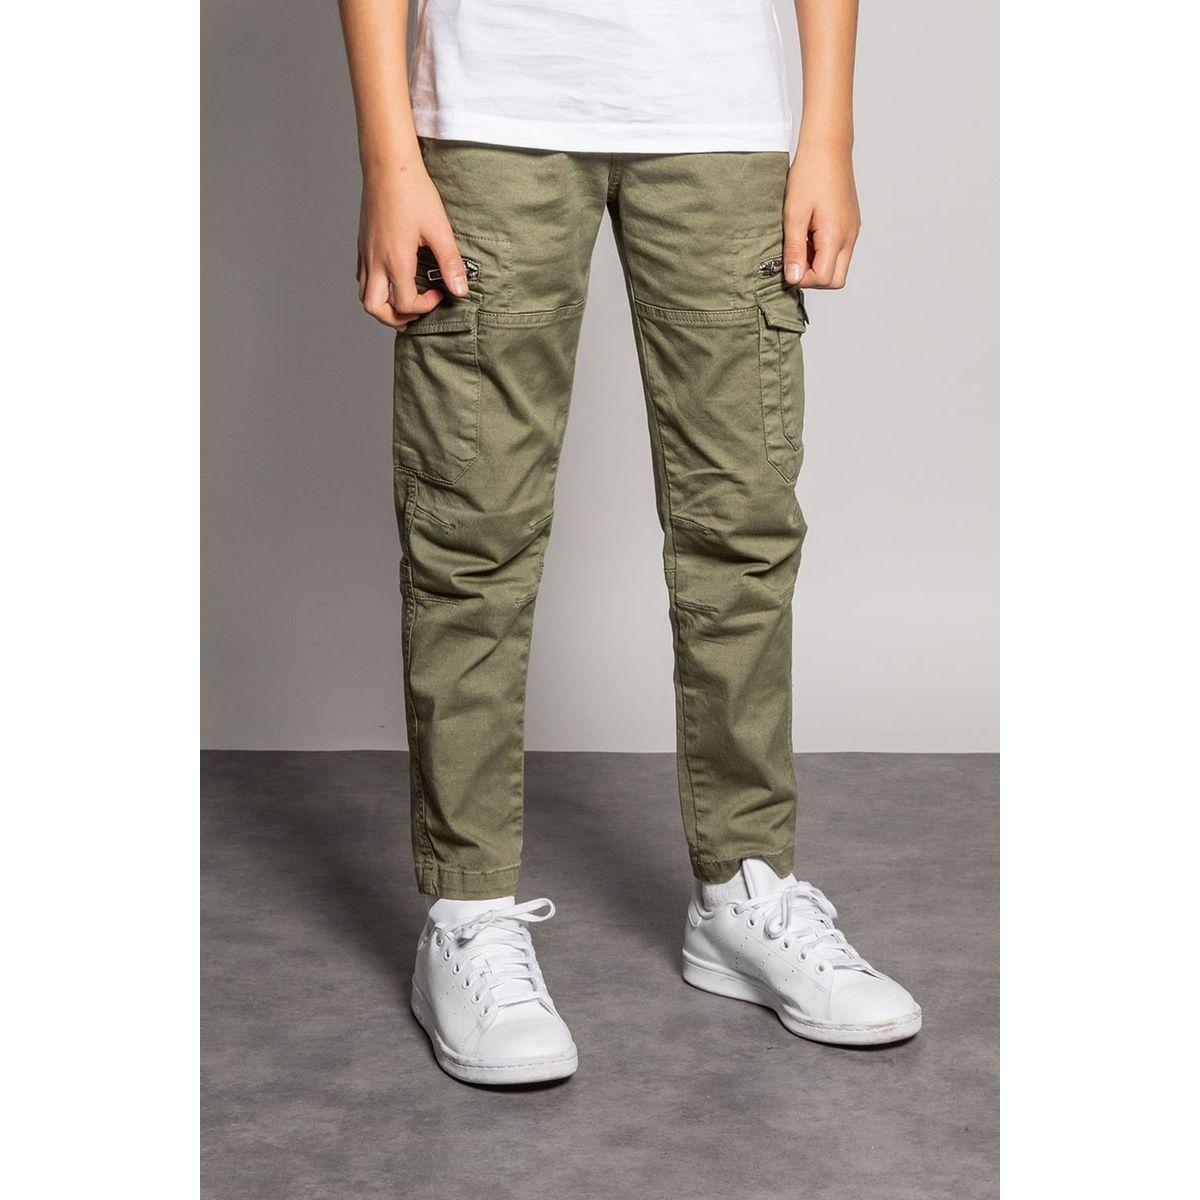 Pantalon cargo clim DANAKIL